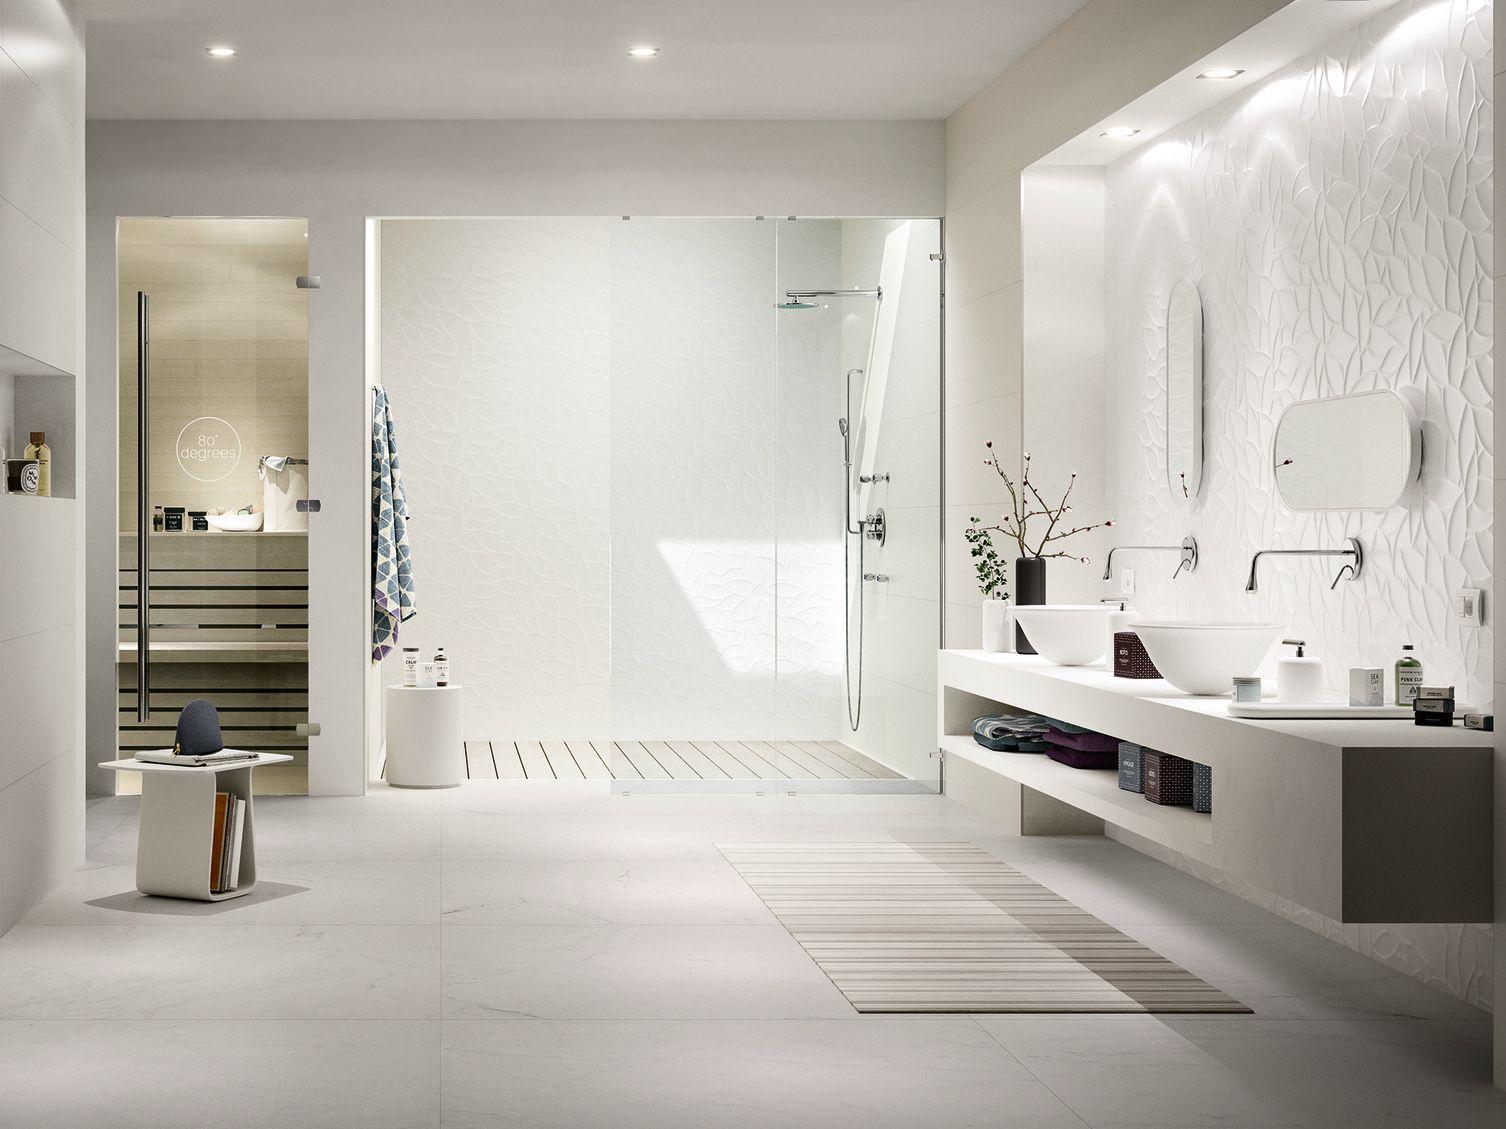 rev tement de sol en gr s c rame effet marbre allmarble by. Black Bedroom Furniture Sets. Home Design Ideas